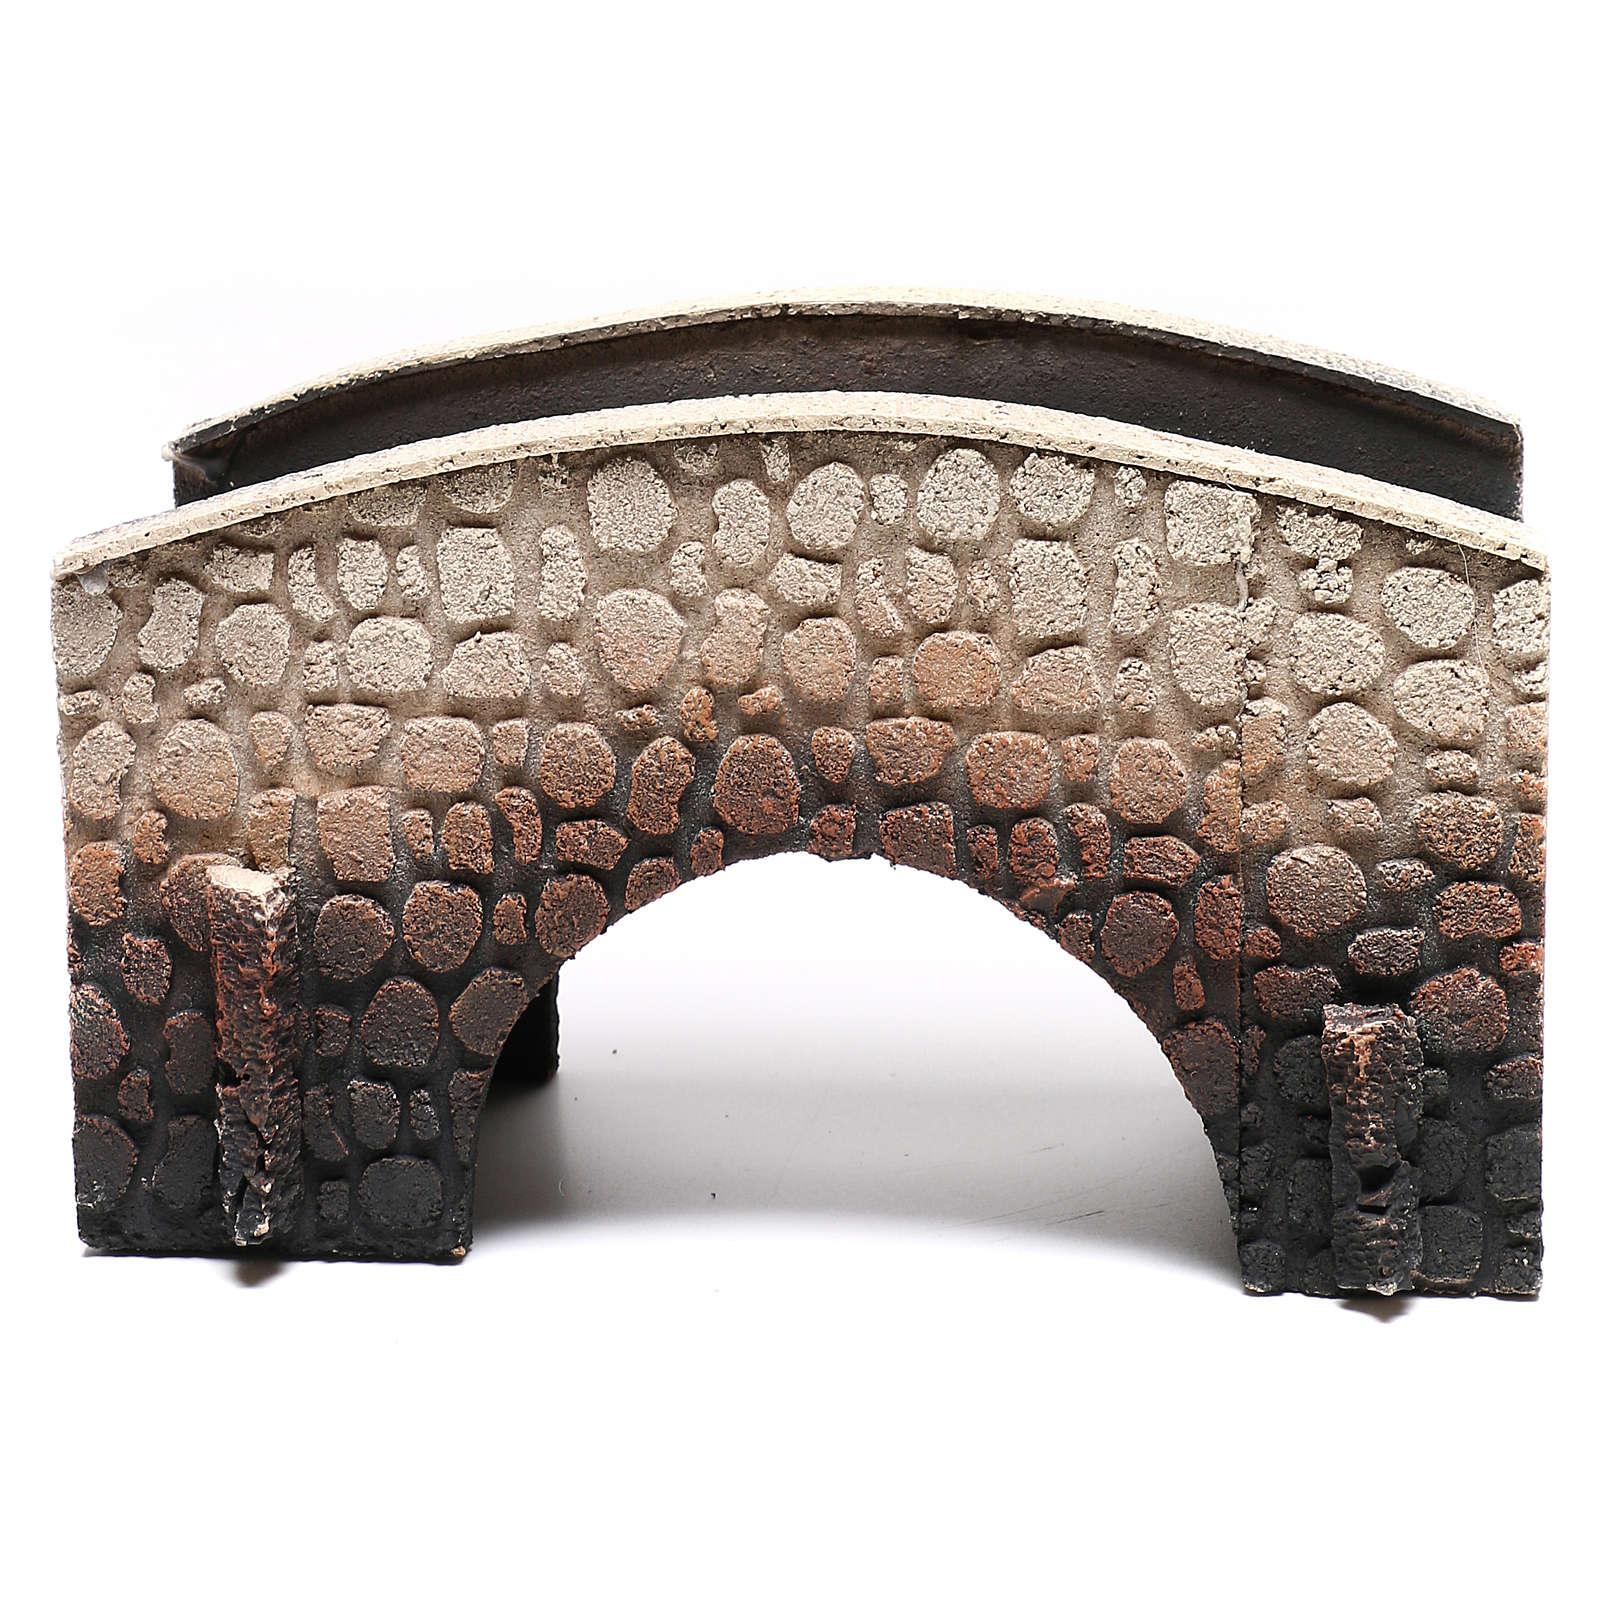 Pont arqué crèche liège 16x25x11cm 4